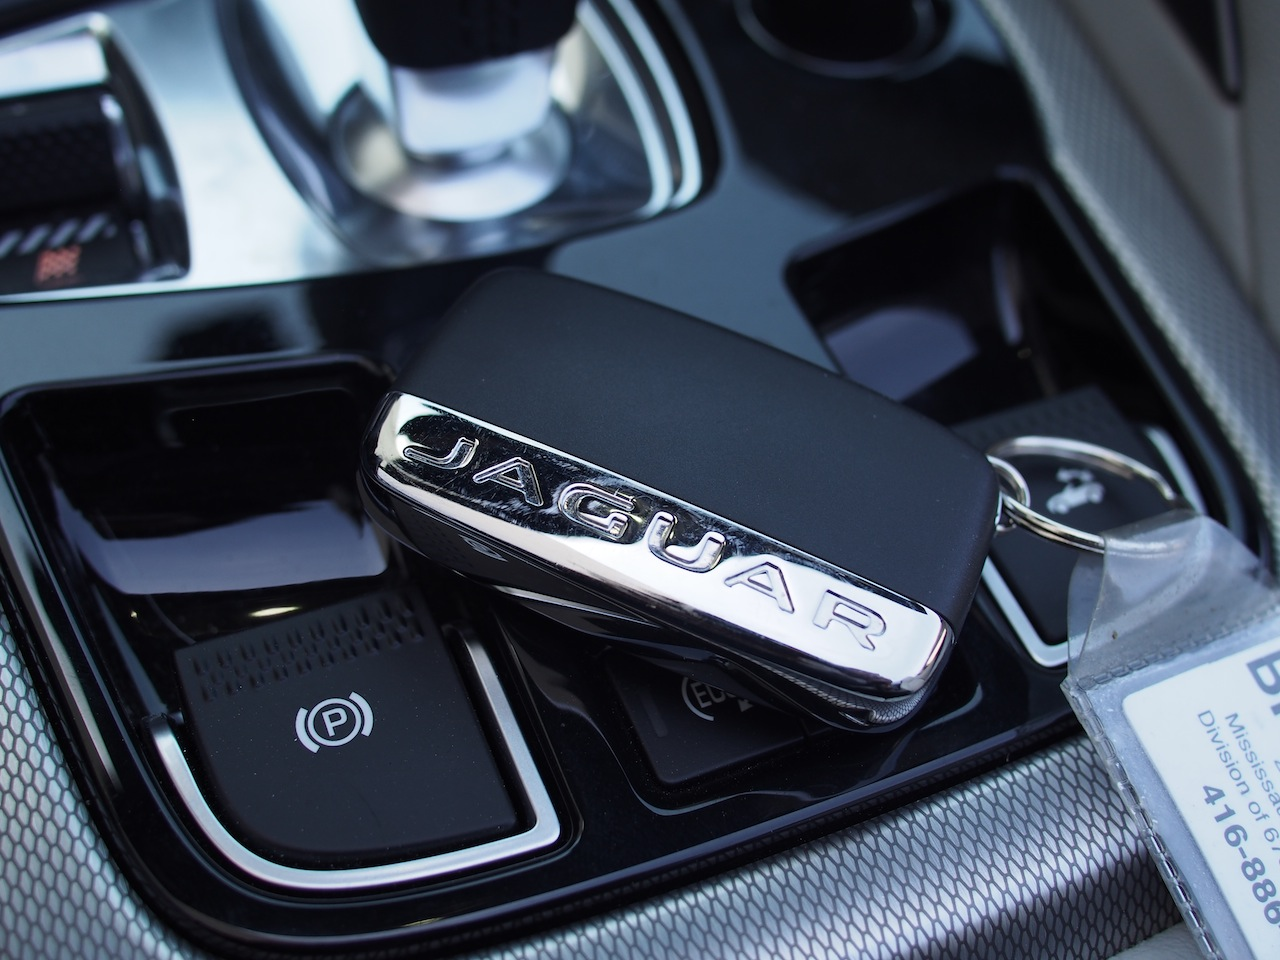 push blade new keys to start key remote xf entry smart sale jaguar keyless prox oem remotes catalog fob for used fobs